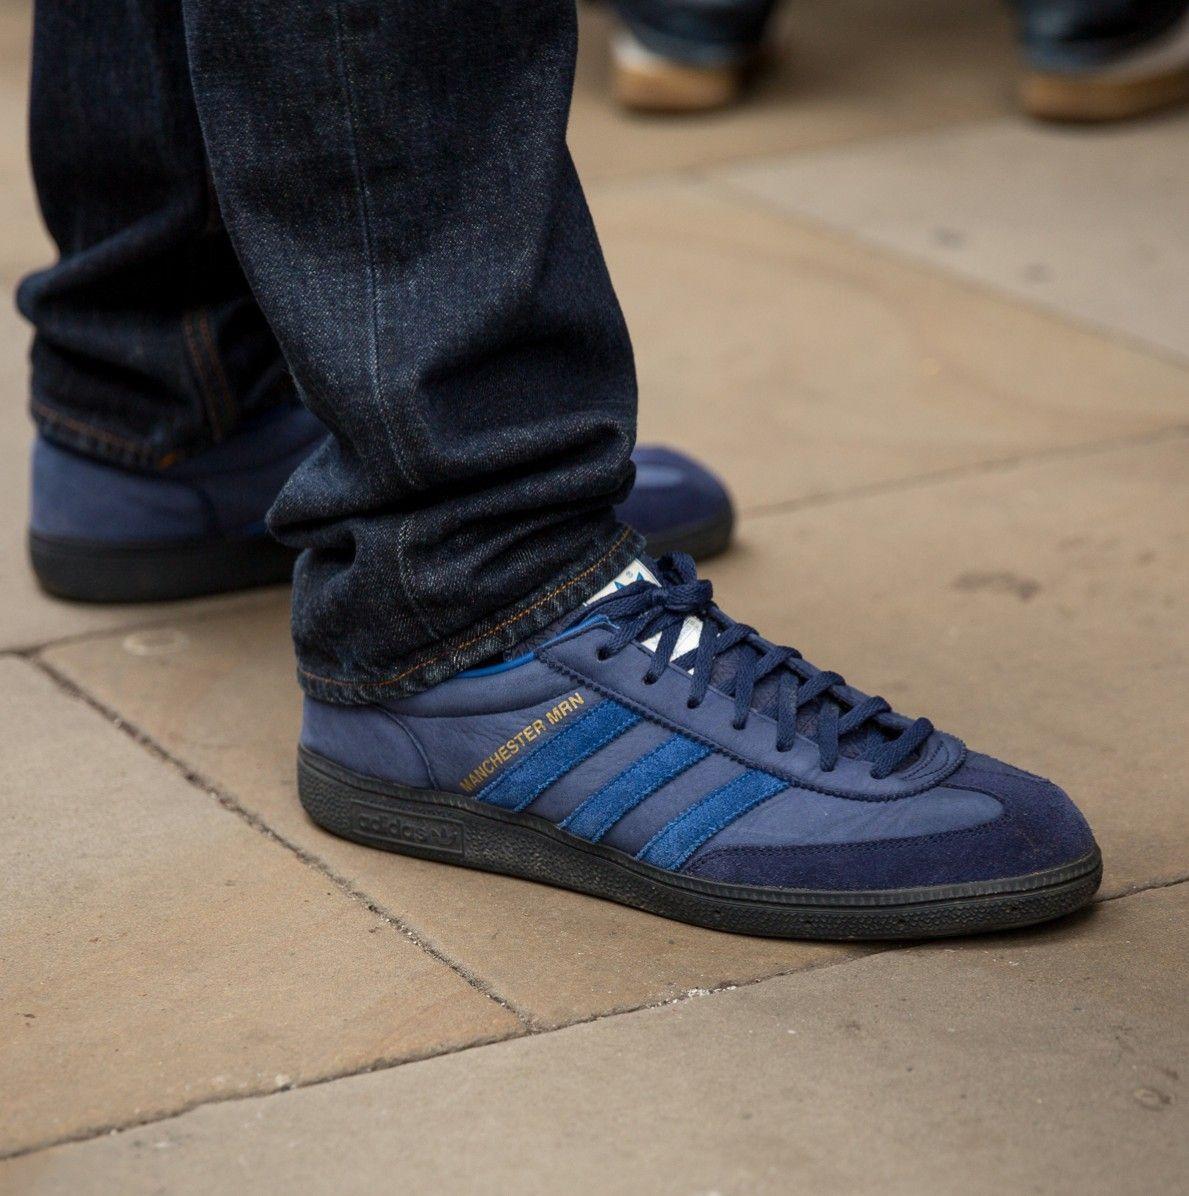 cheap for discount 9e98d a57b0 Manchester MRN on feet on the street Adidas Og, Adidas Shoes, Adolf Dassler,